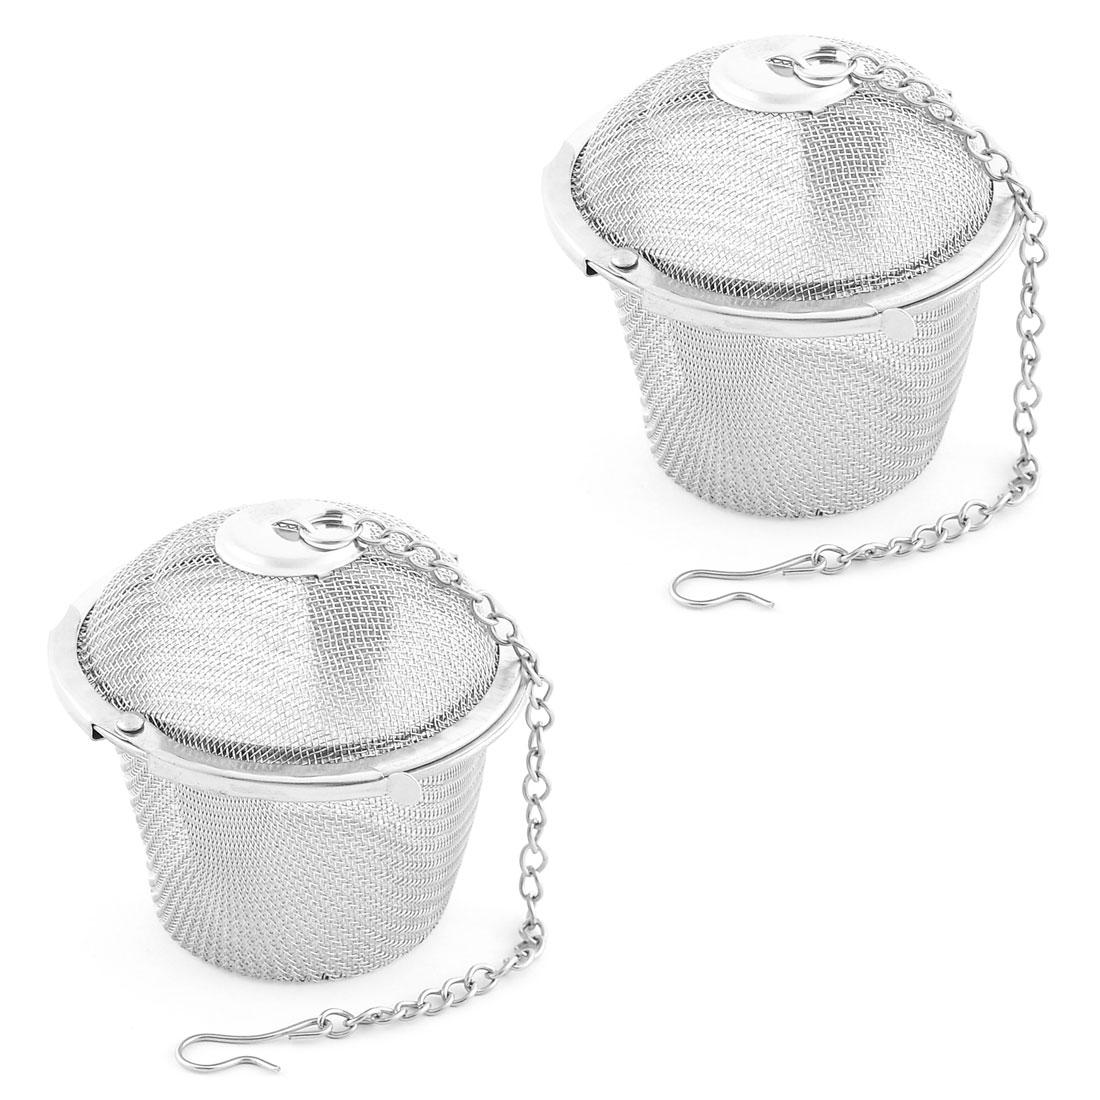 Household Mesh Locked Infuser Filter Tea Stainer Silver Tone 64mm Diameter 2PCS